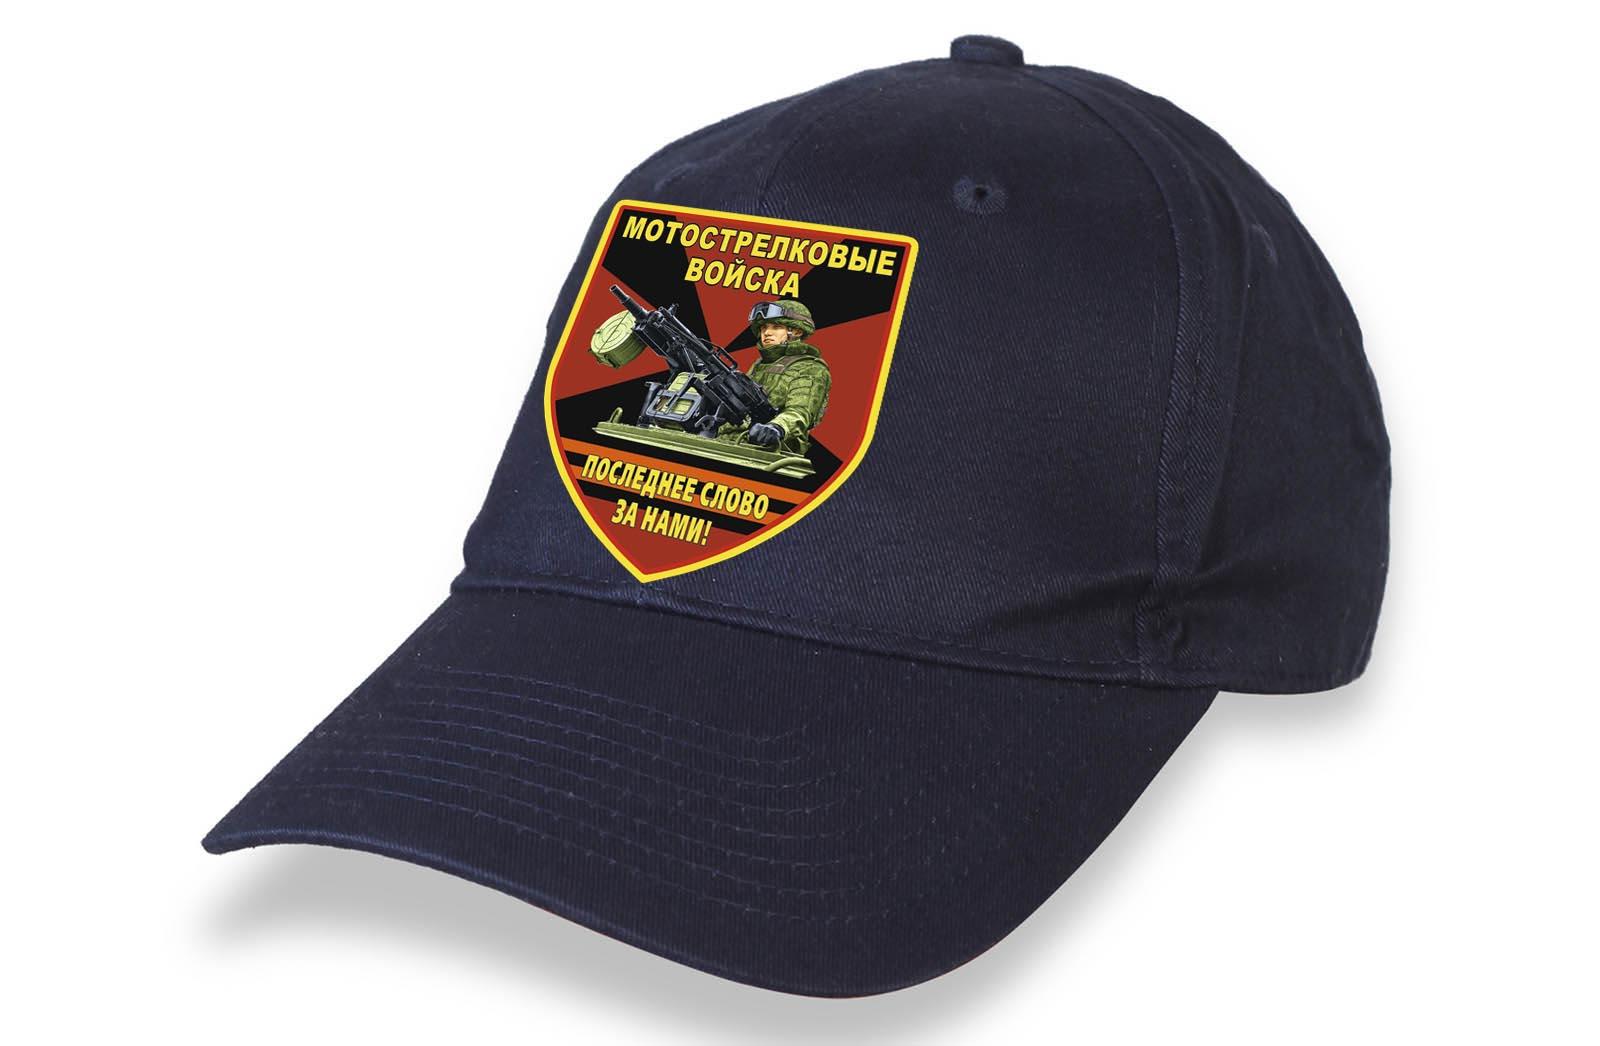 Тёмно-синяя кепка Мотострелковые войска